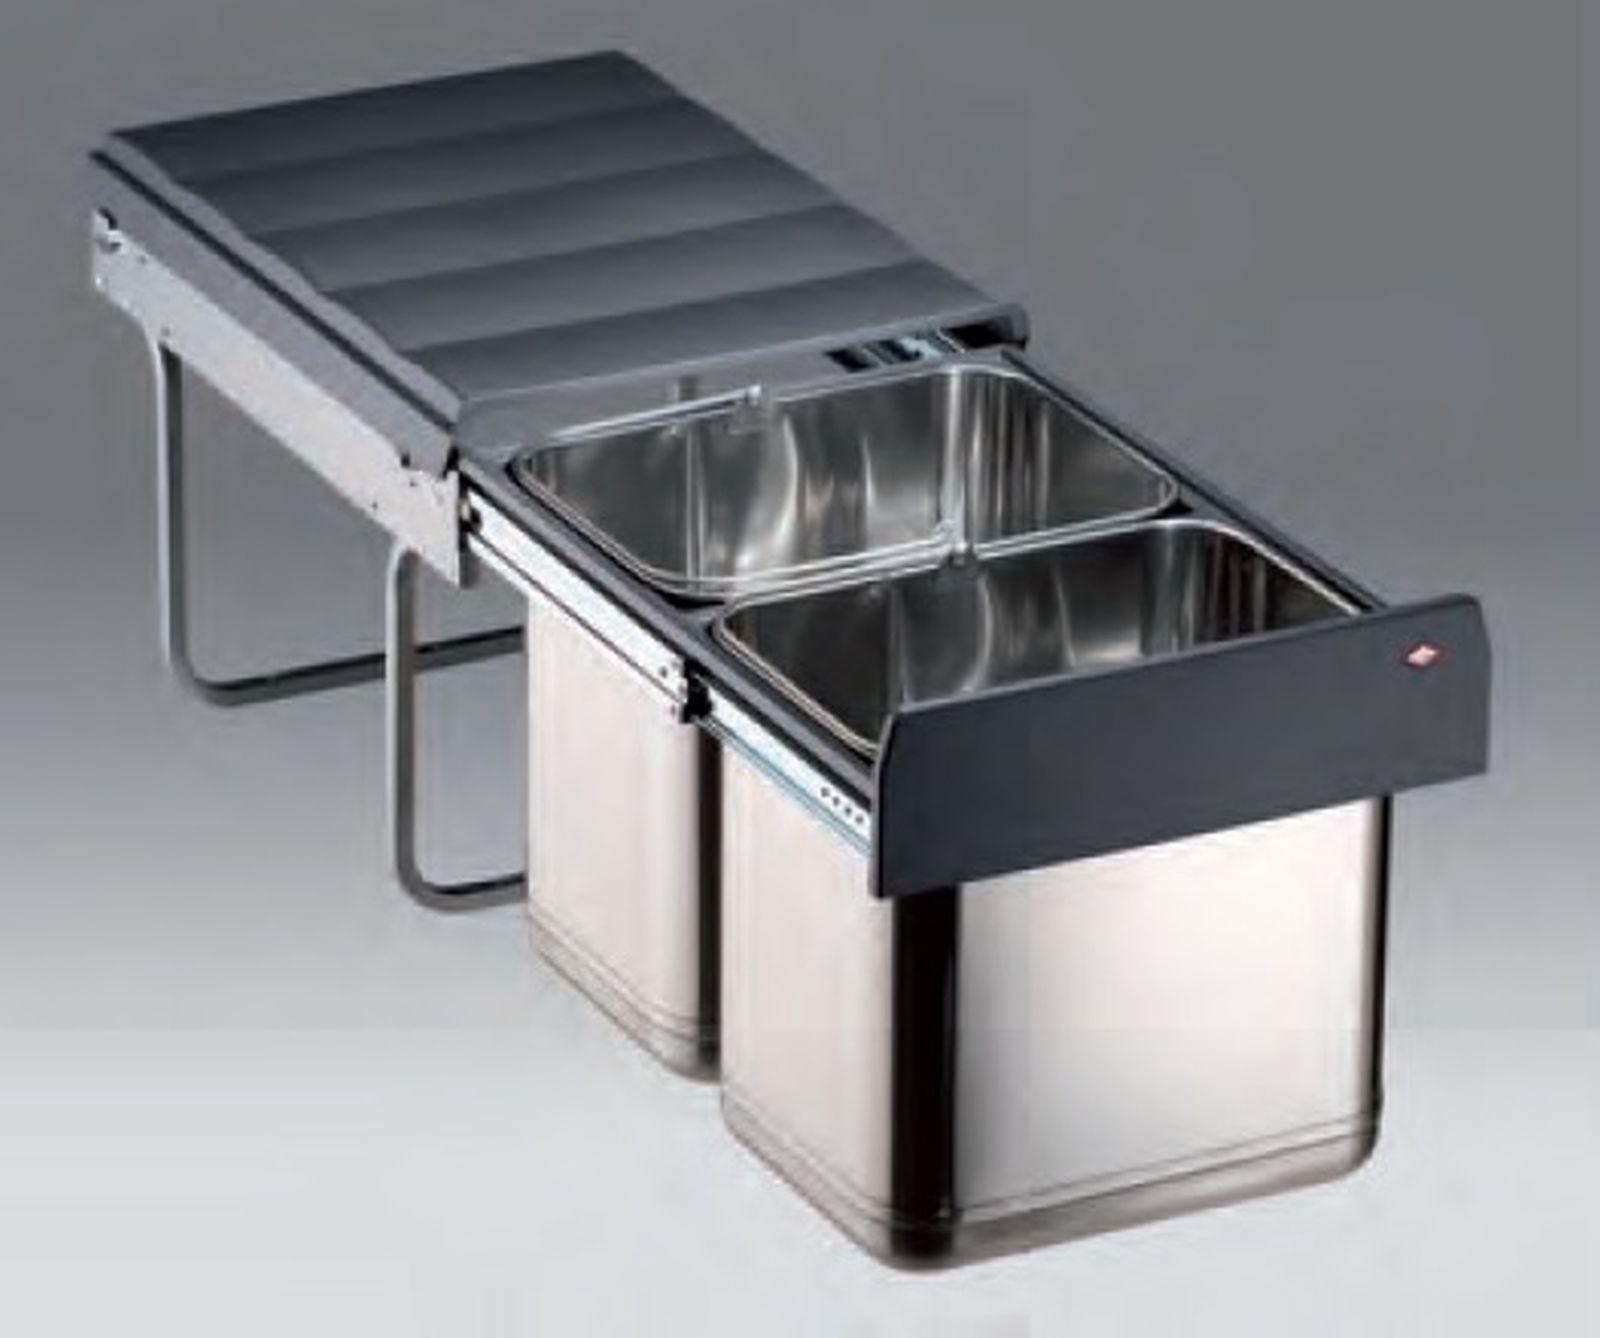 Wesco Edel Master 40DT Edelstahl Abfall Mülleimer Küche 2 x 16 Liter ...